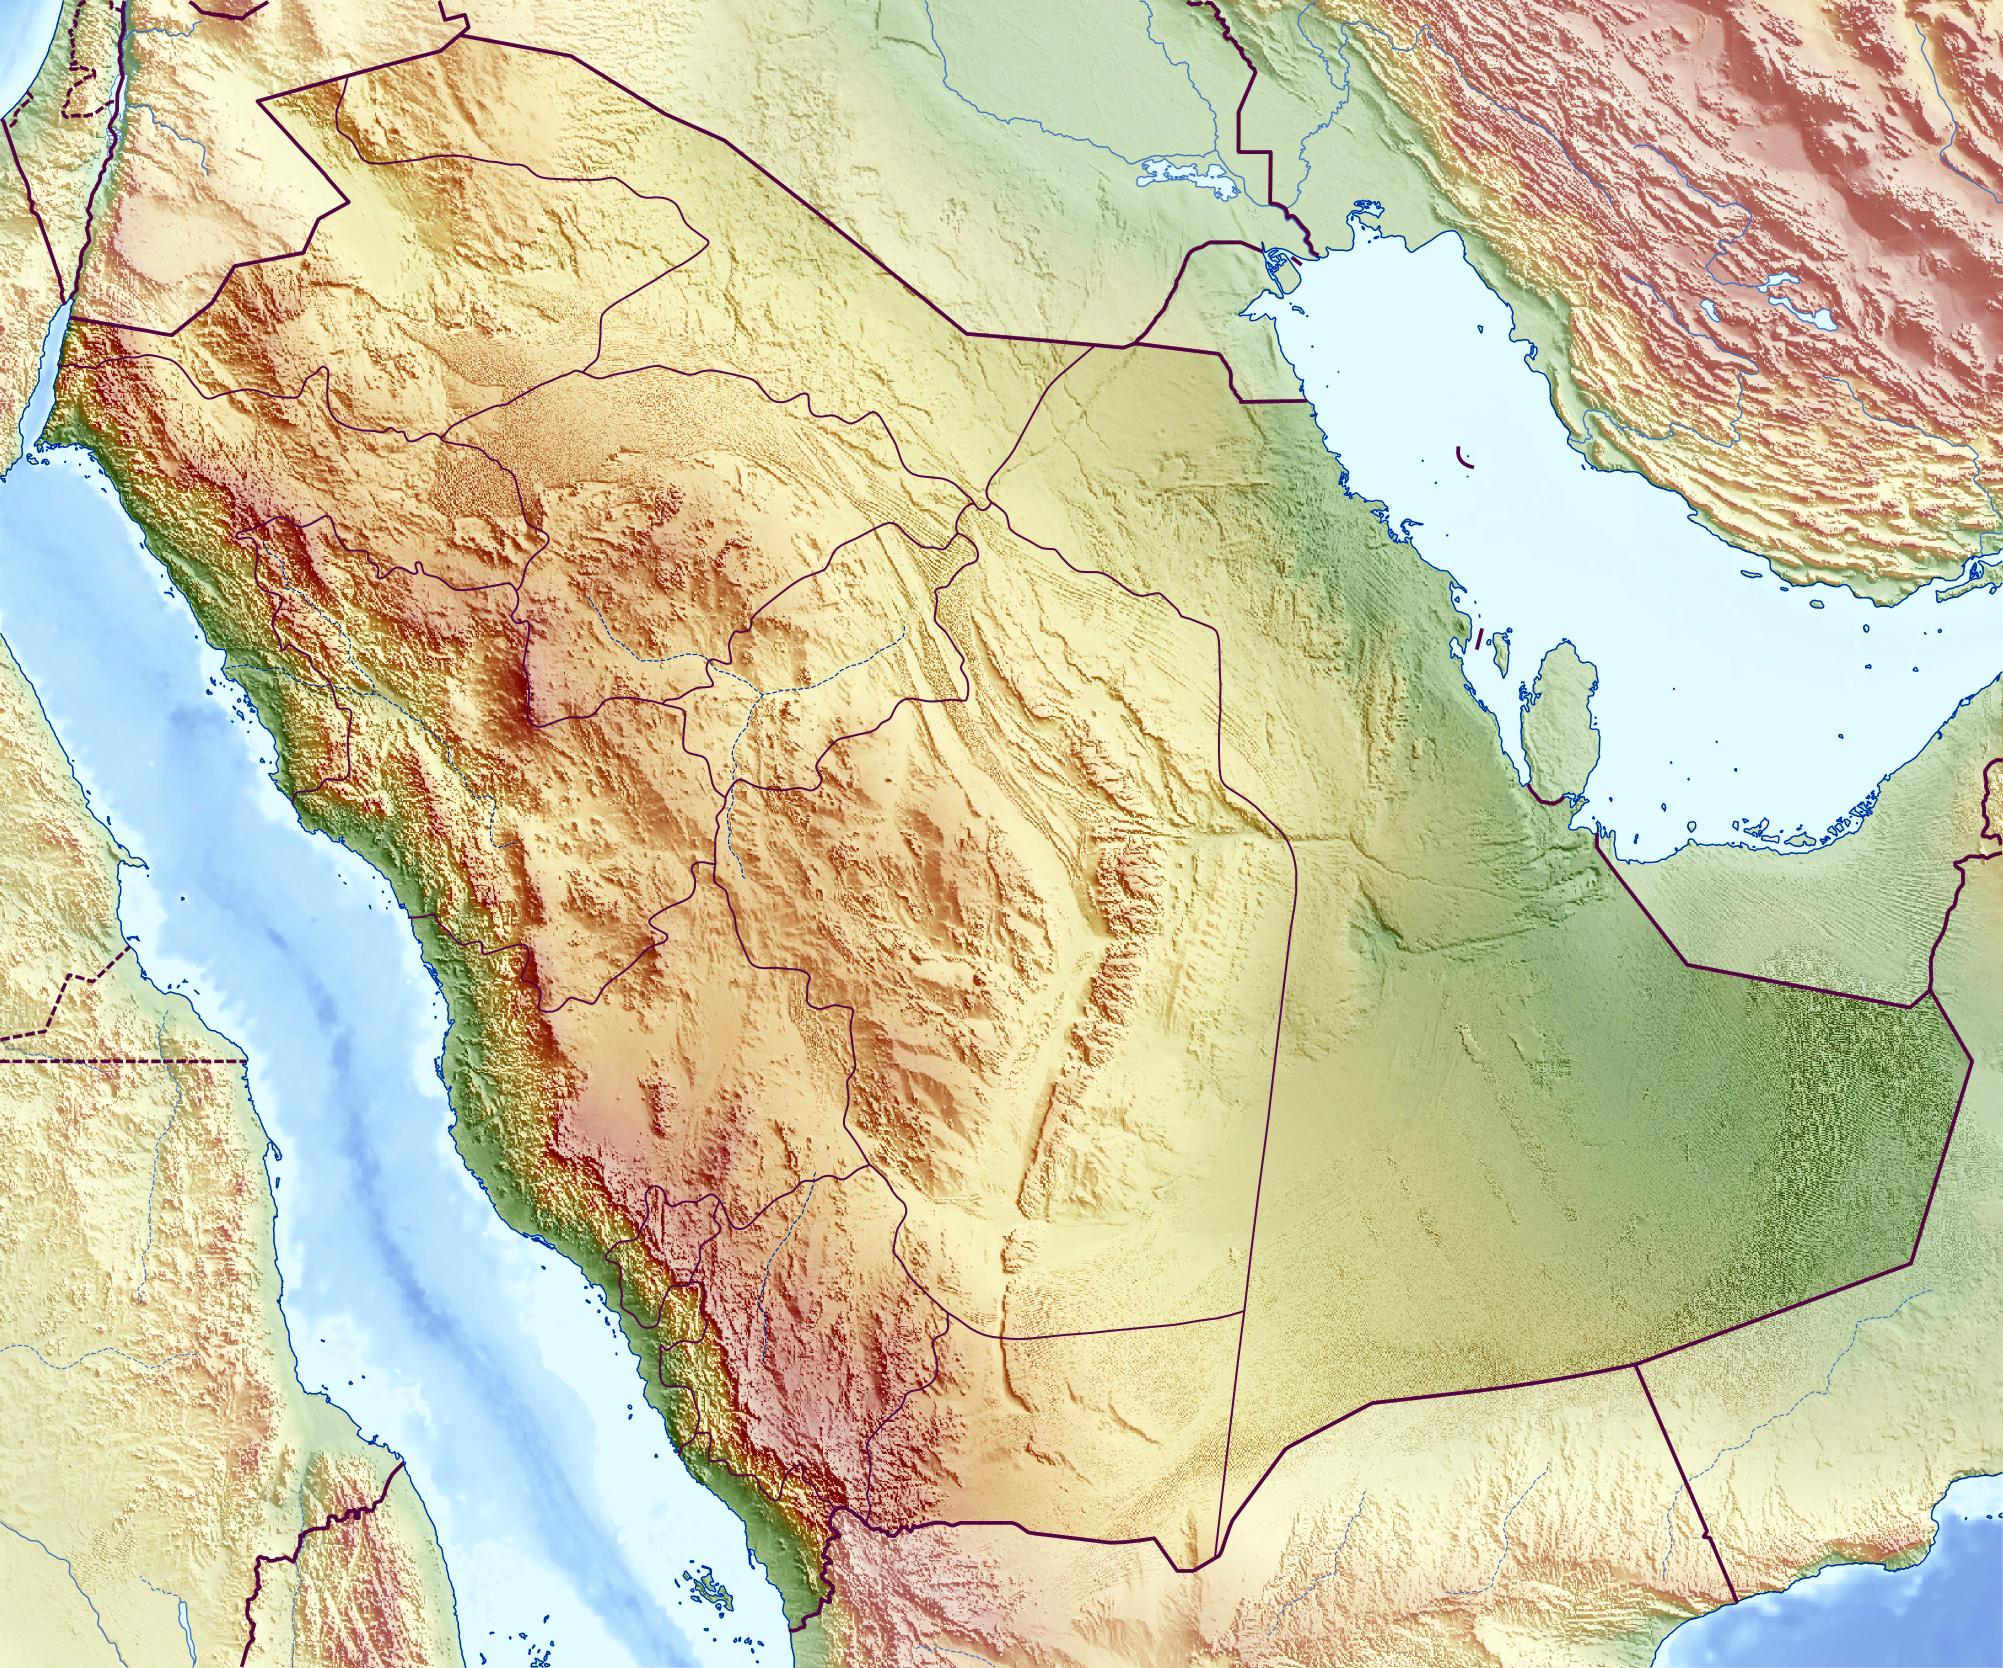 Topographic Map Of Saudi Arabia.Maps Of Saudi Arabia Detailed Map Of Saudi Arabia In English